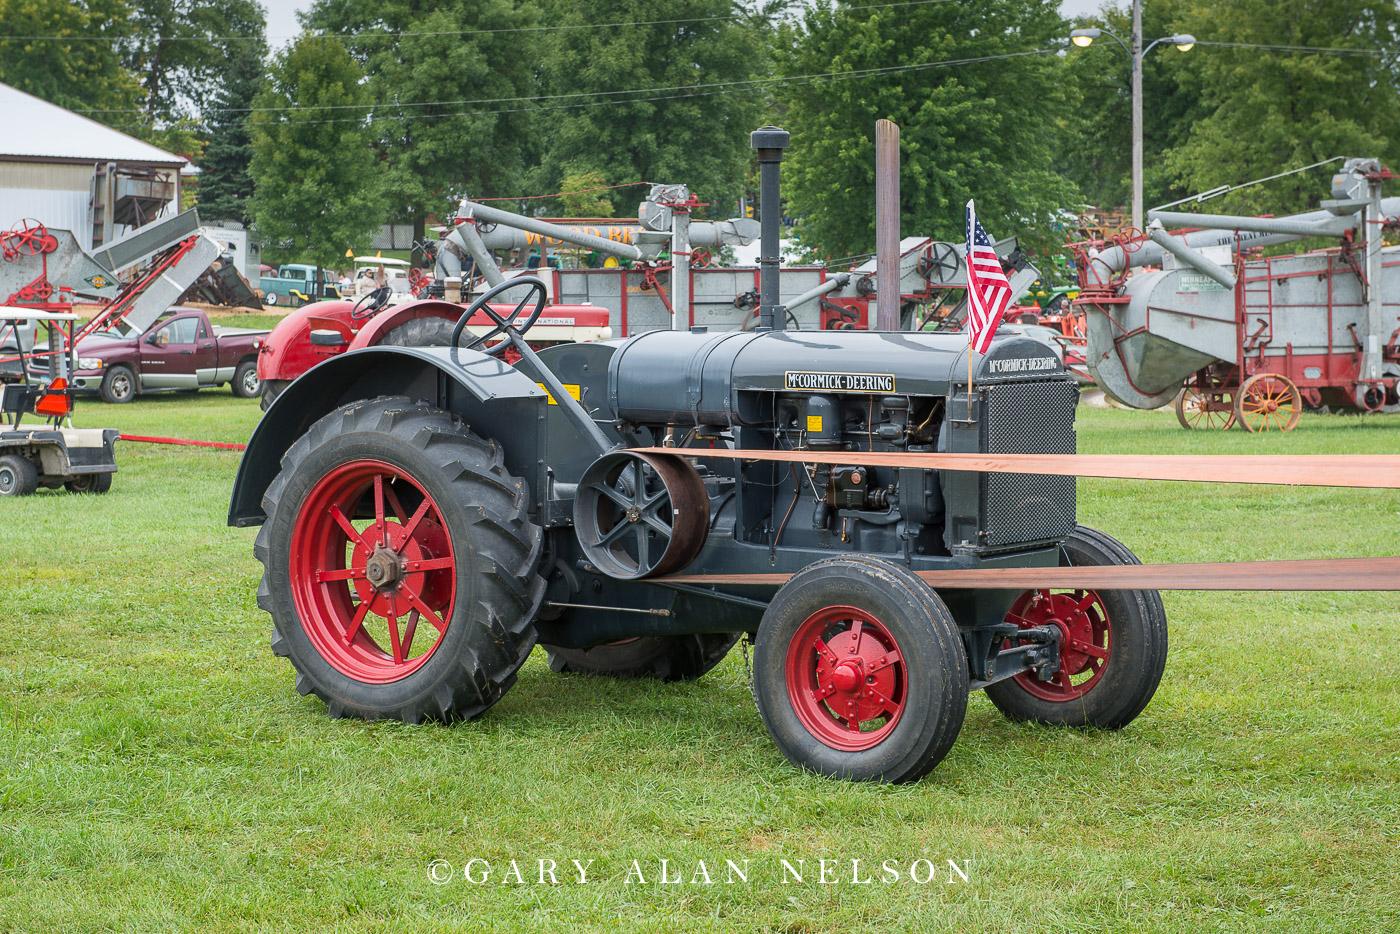 Farmall, International Harvester, antique tractor, photo